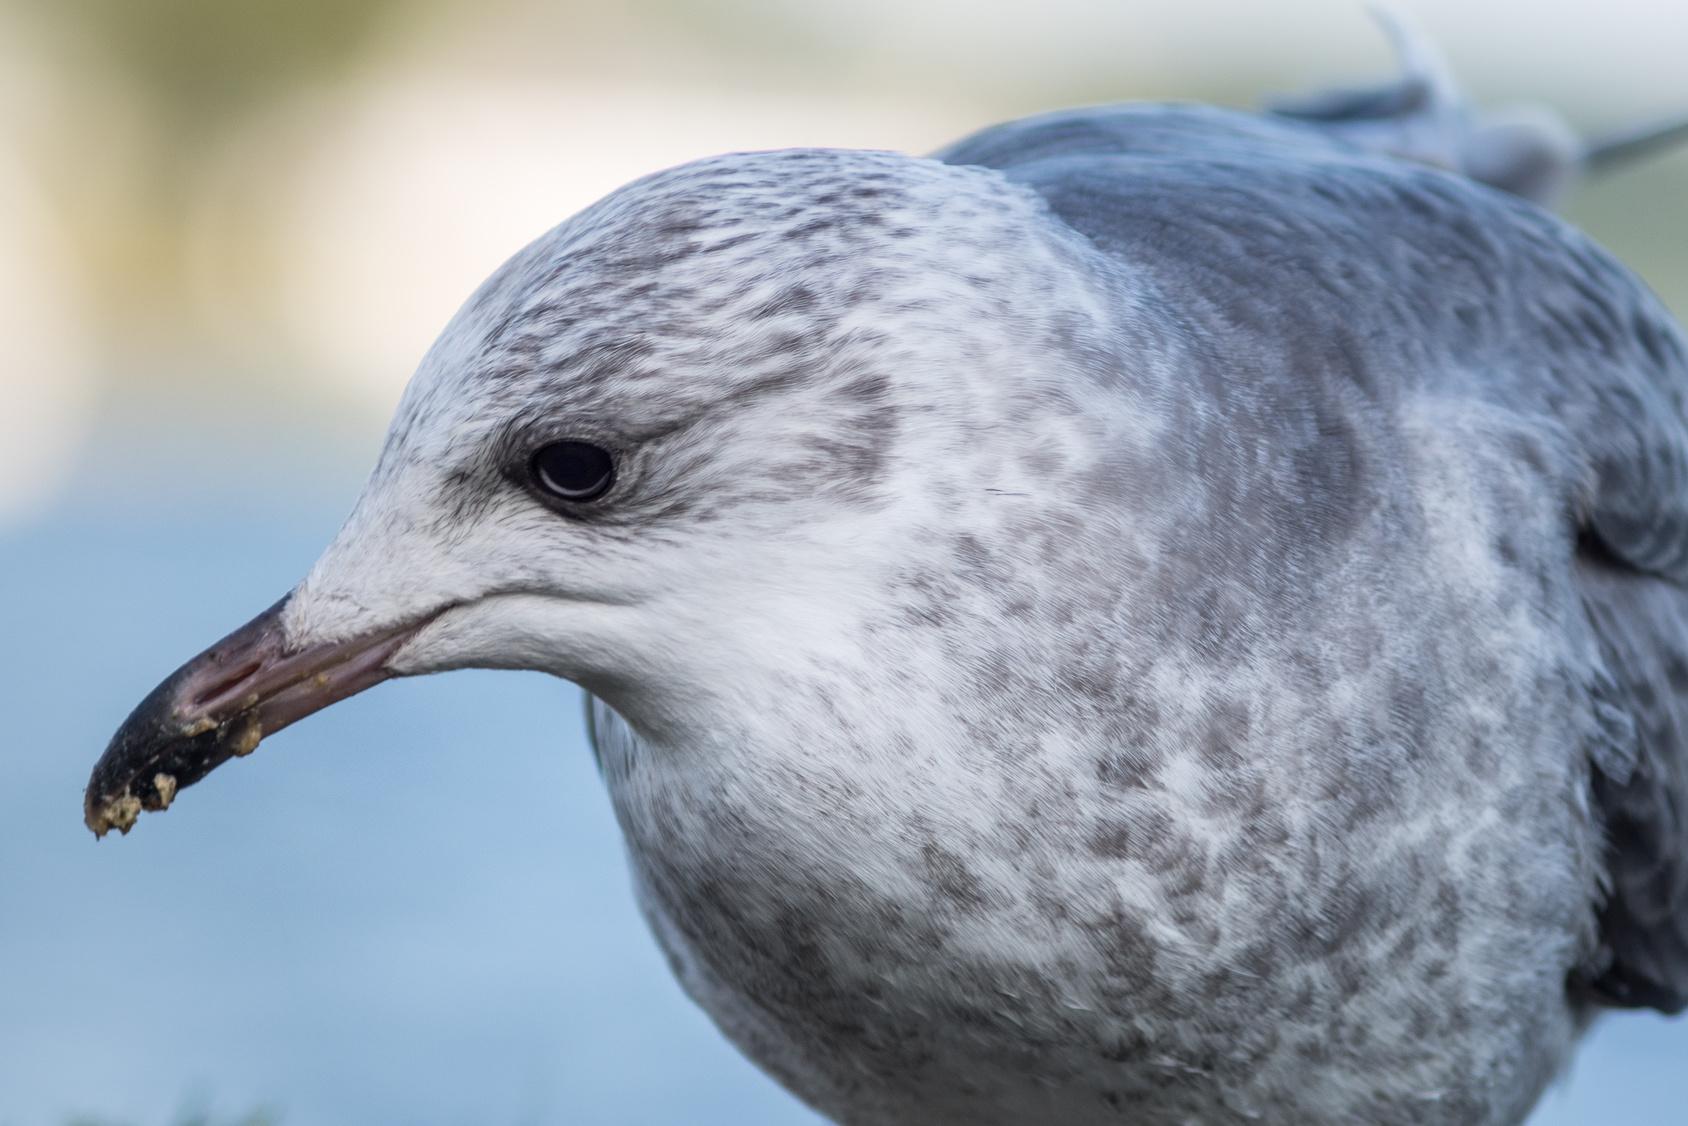 Gulls need Government response, says MSP